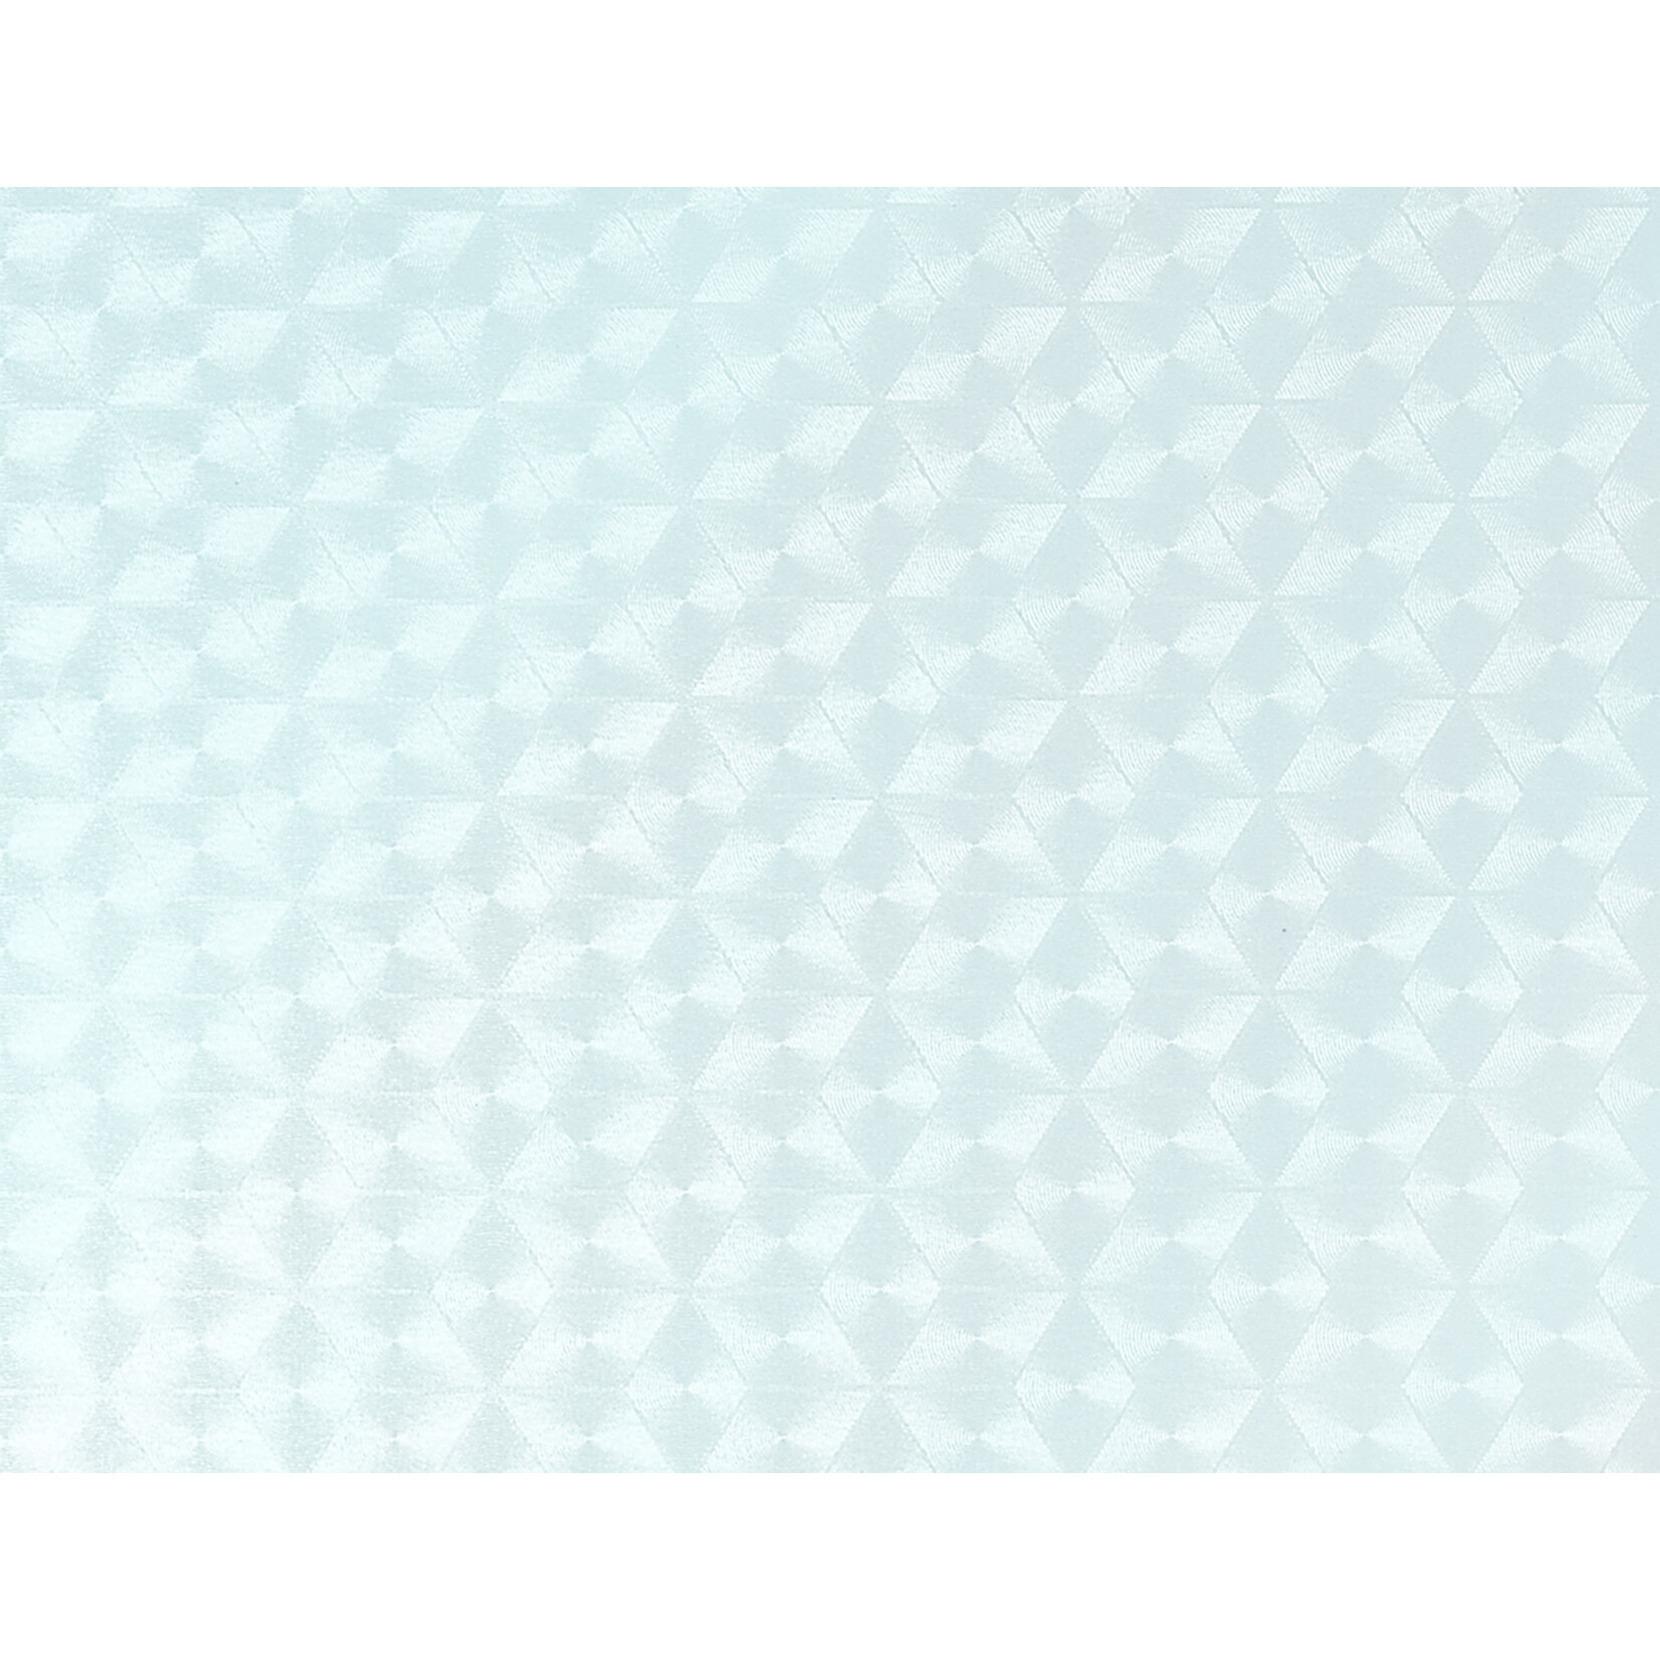 Raamfolie ruitjes semi transparant 45 cm x 2 meter zelfklevend